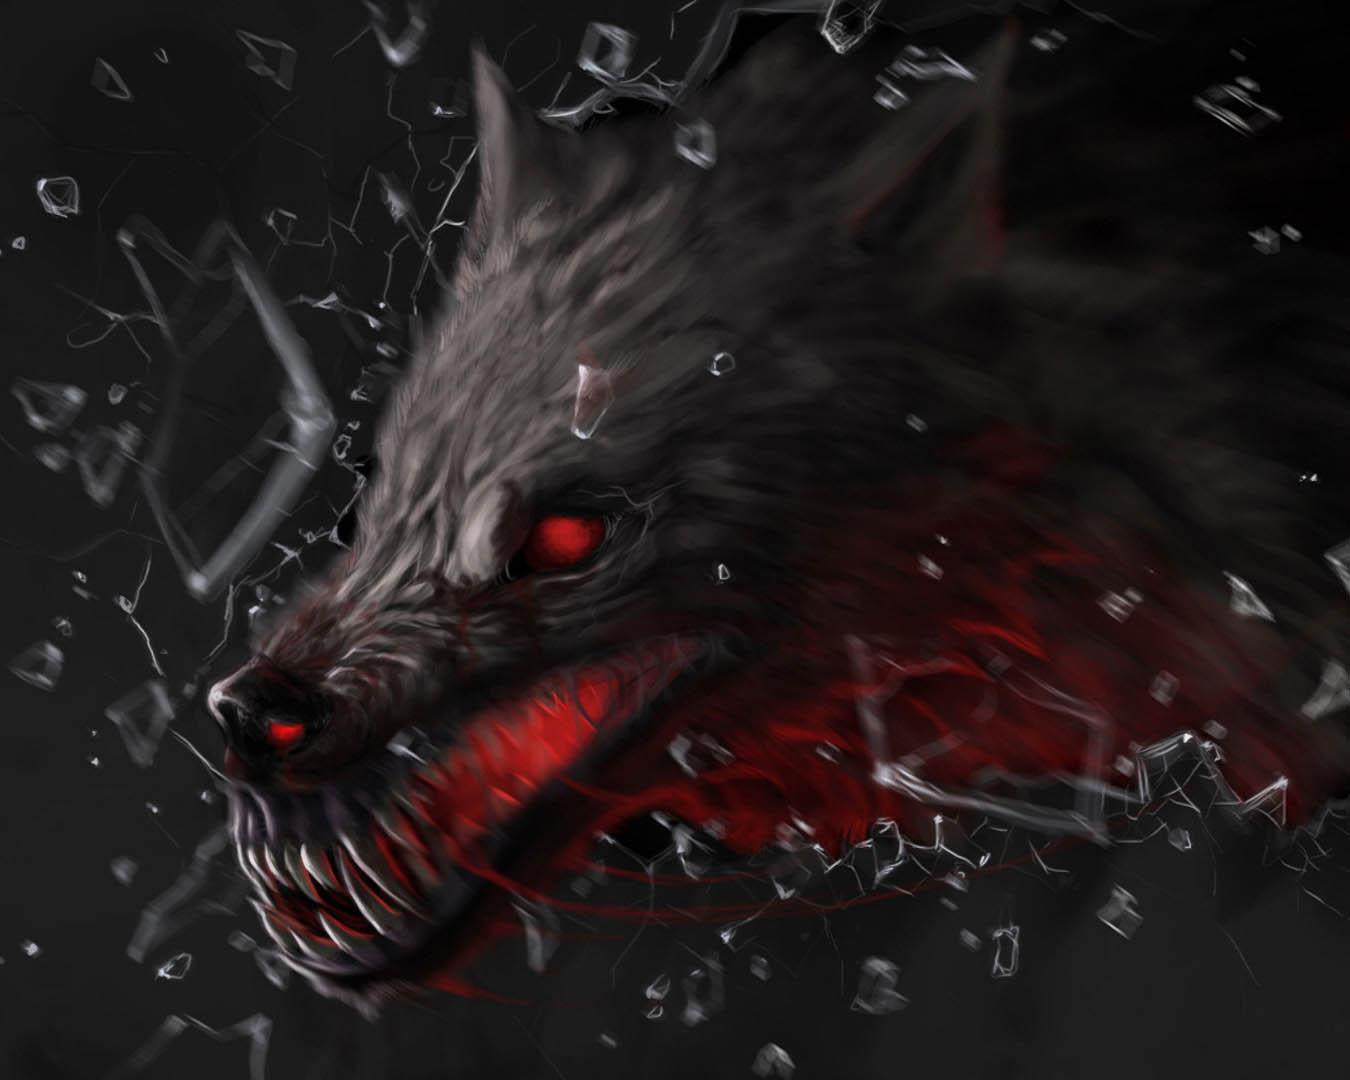 Hd wallpaper beach - Dark Scary Cartoon Wolf In Armor Wallpaper